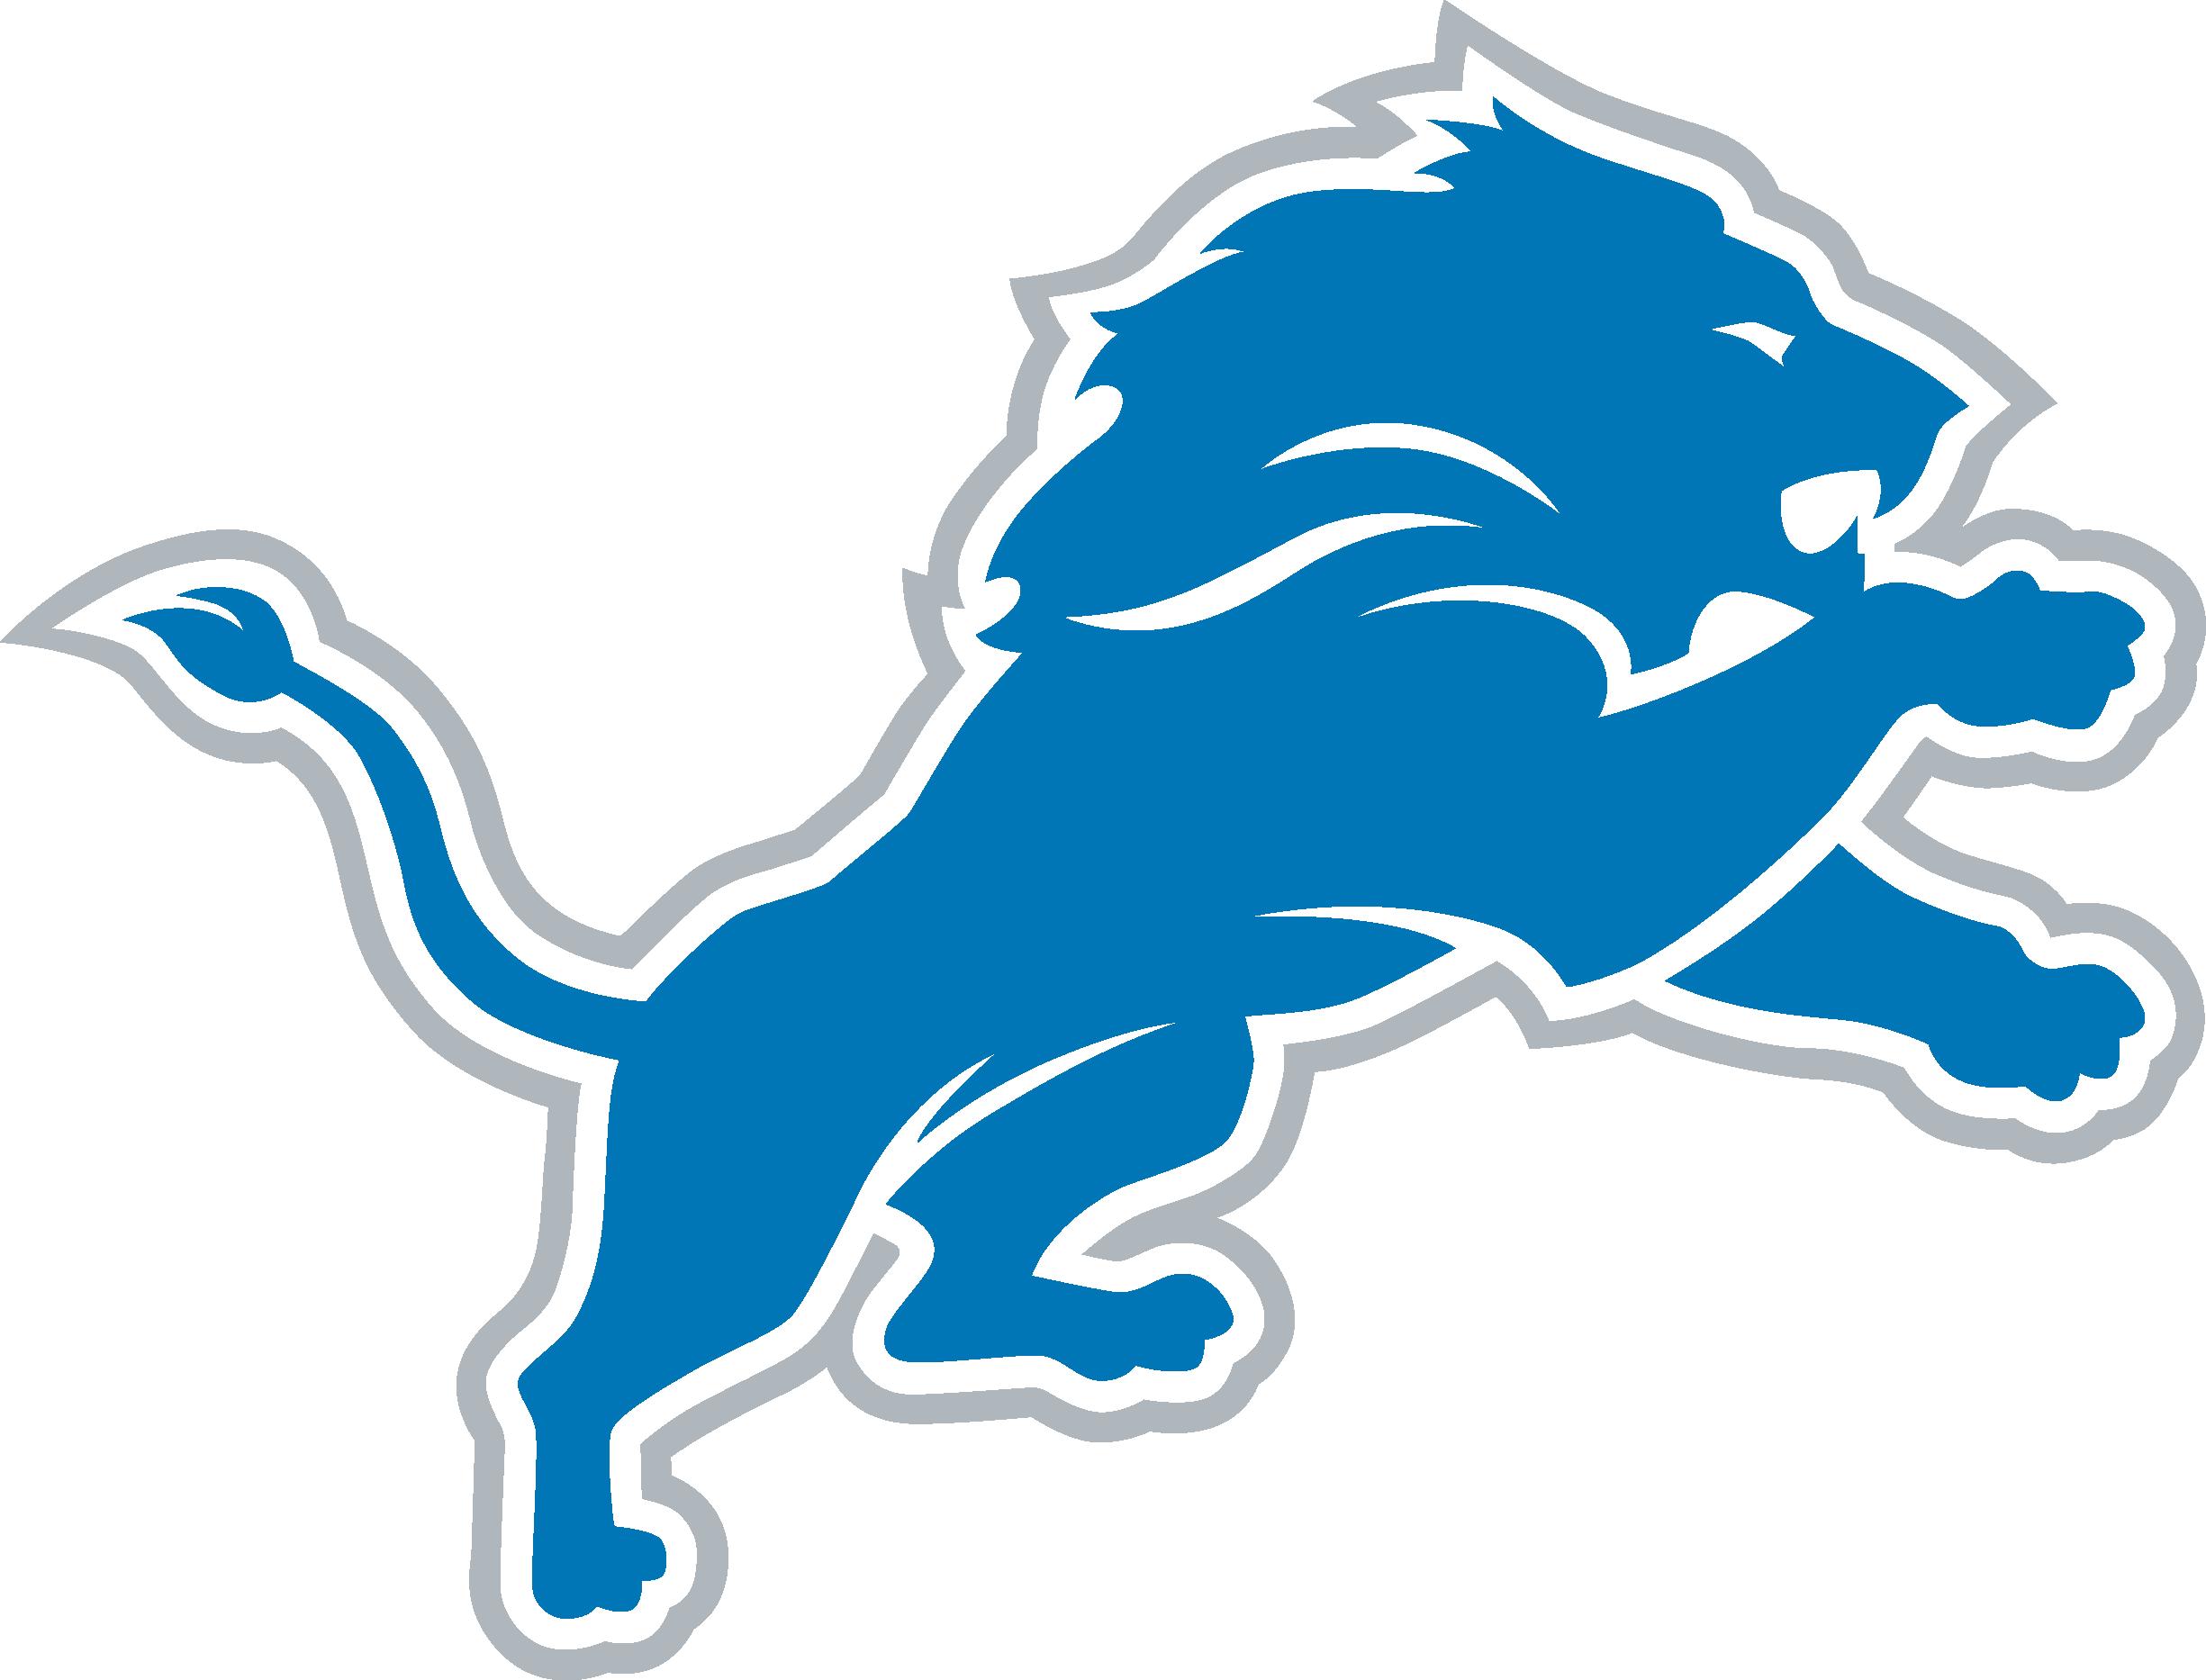 2450x1866 Detroit Lions Logo Vector Eps Free Download, Logo, Icons, Clipart